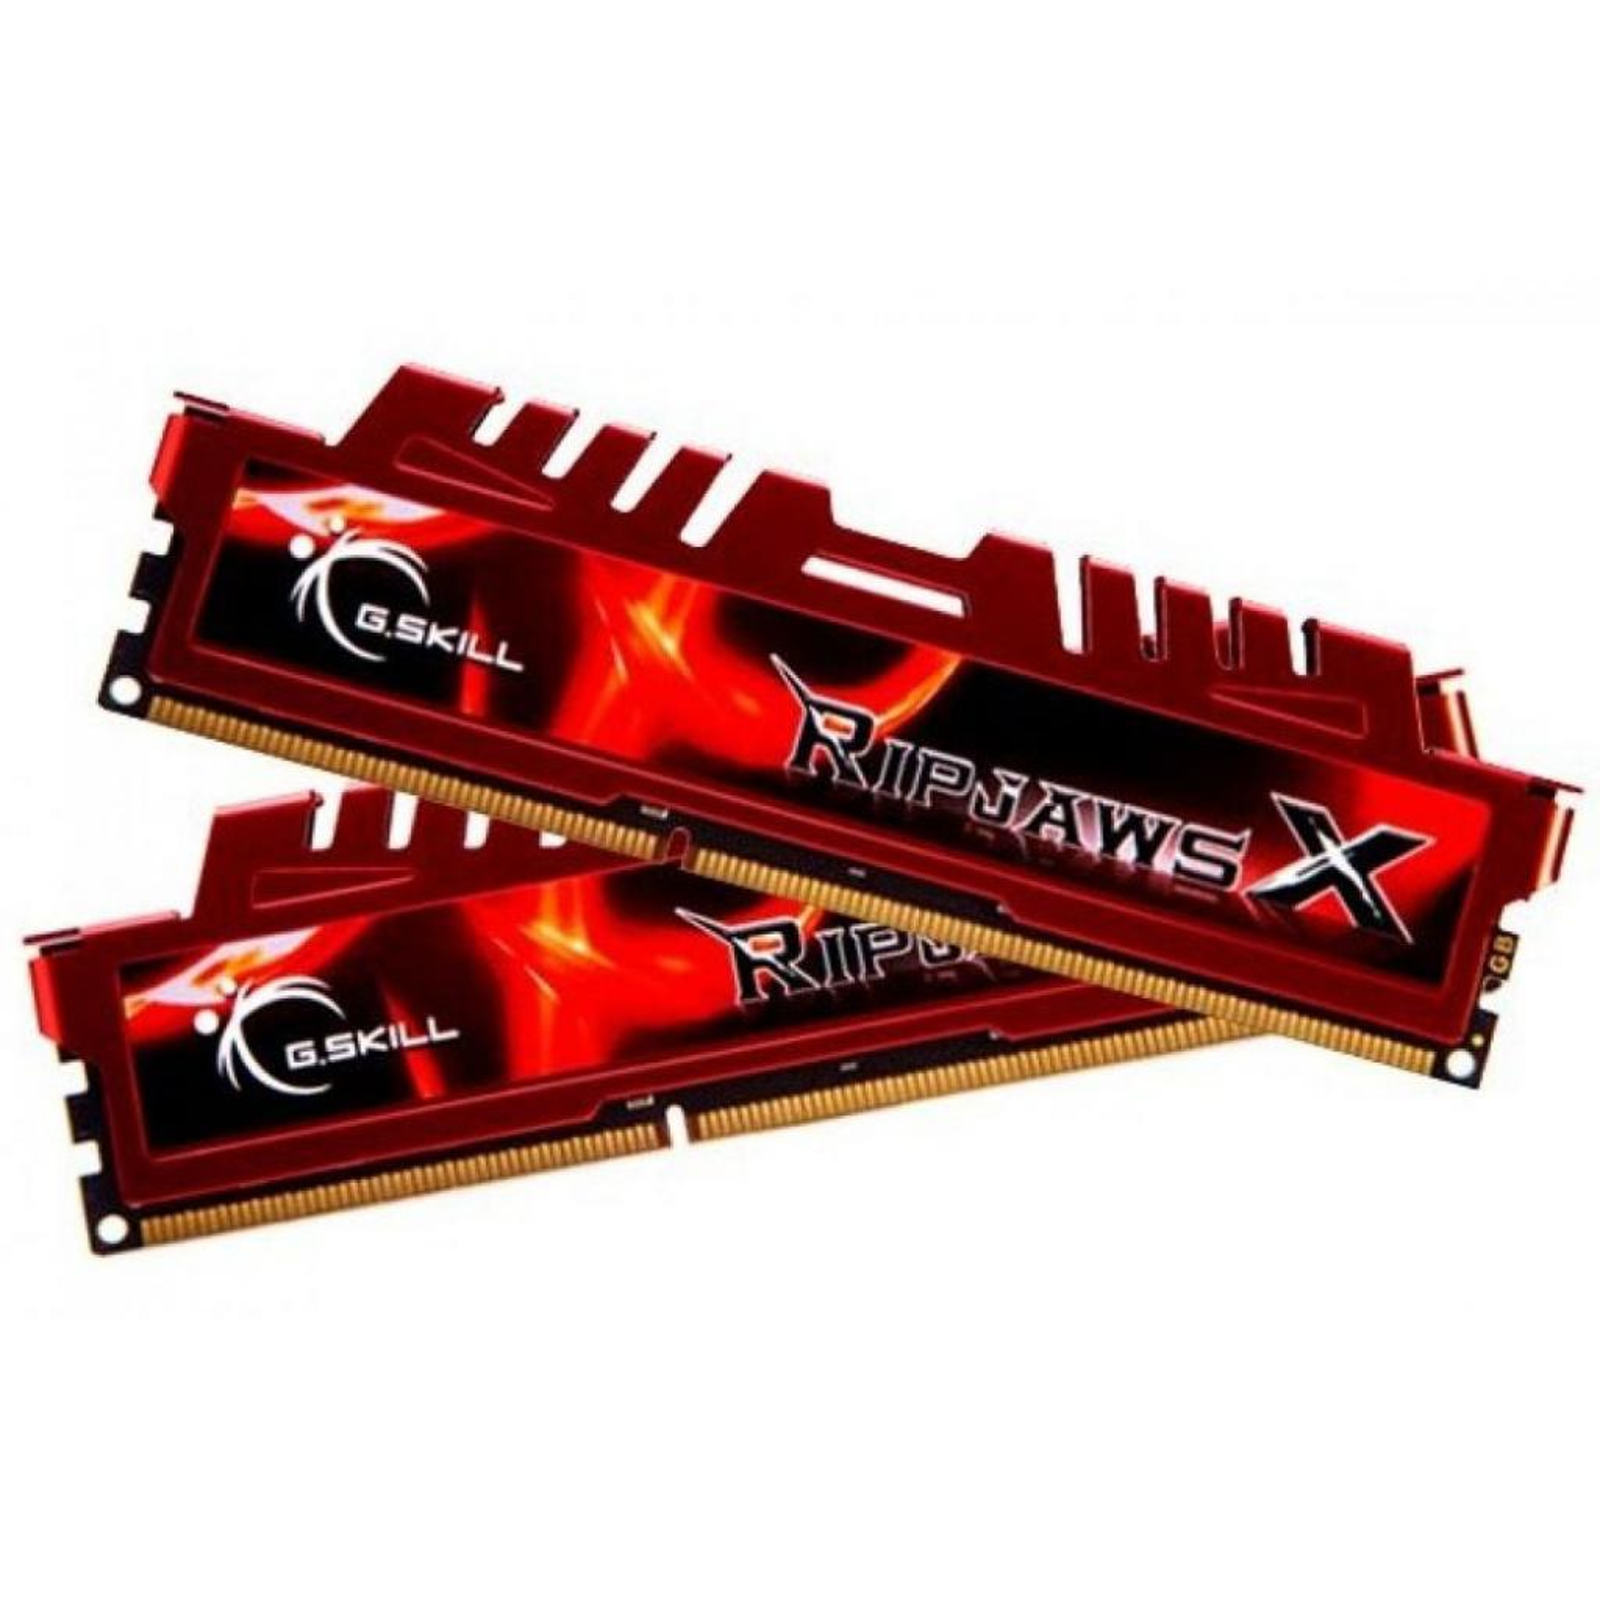 Модуль памяти для компьютера DDR3 8GB (2x4GB) 1866 MHz G.Skill (F3-14900CL9D-8GBXL)